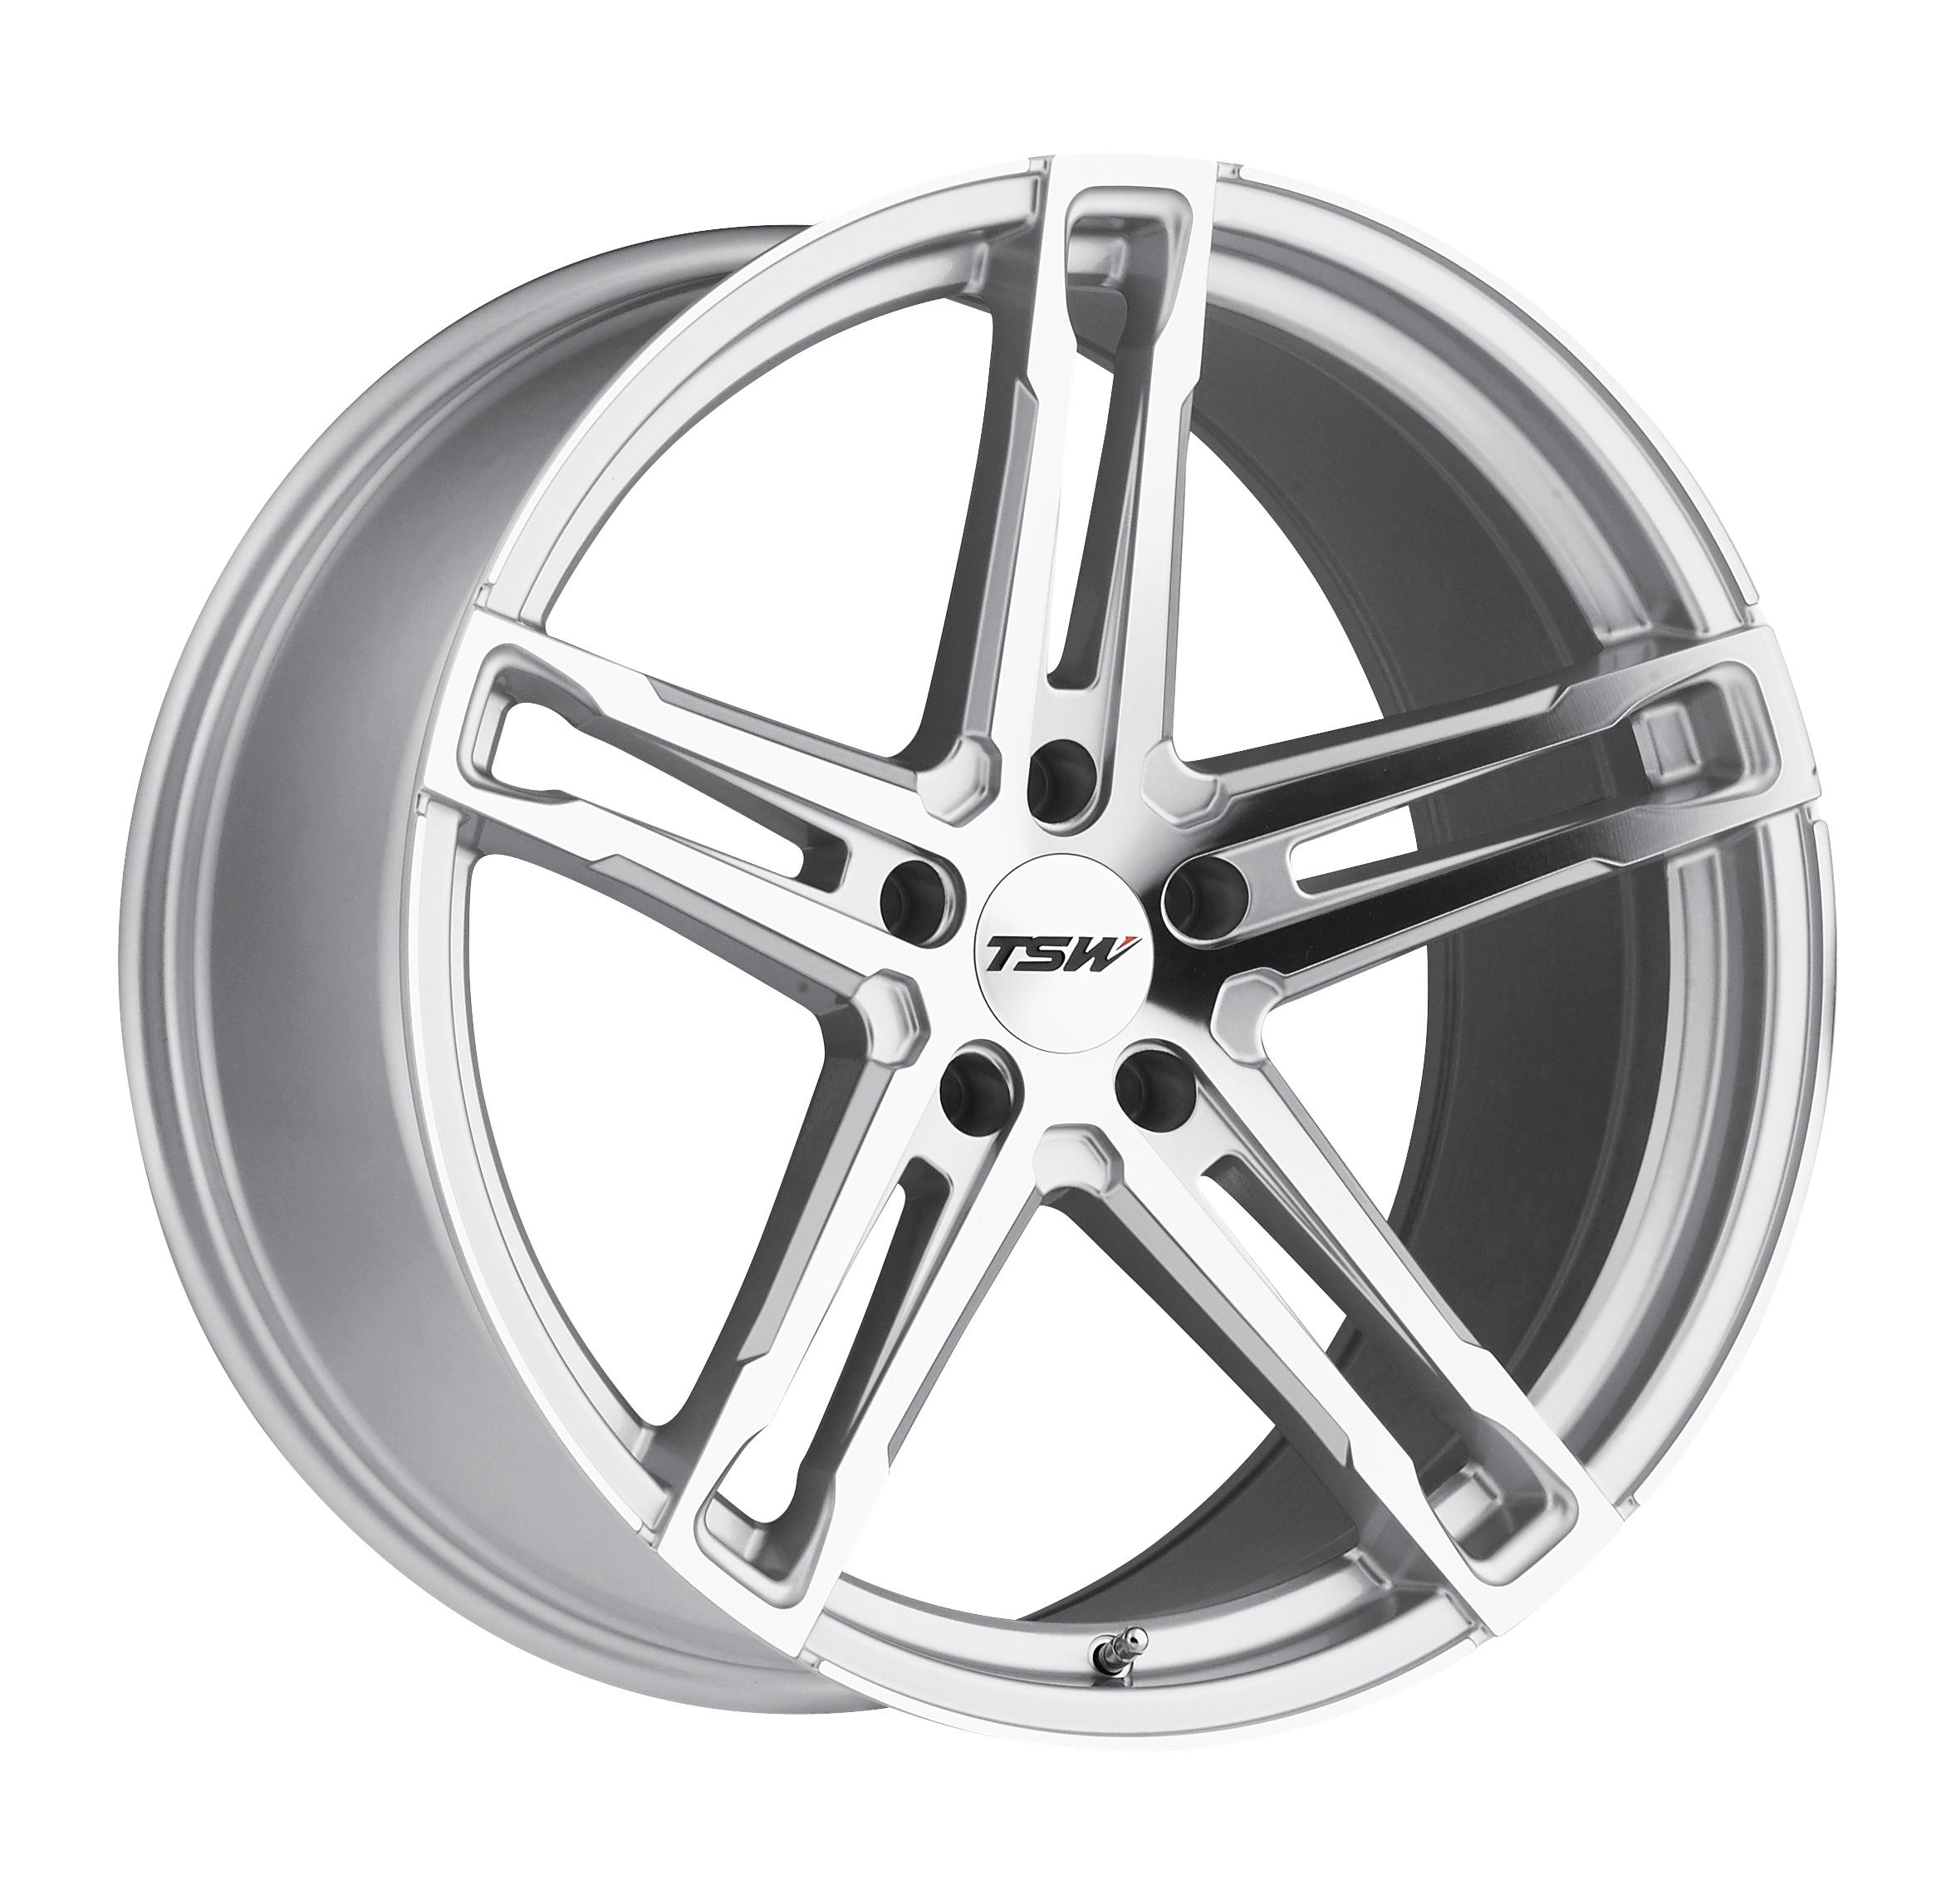 FS06 - MRR Wheels